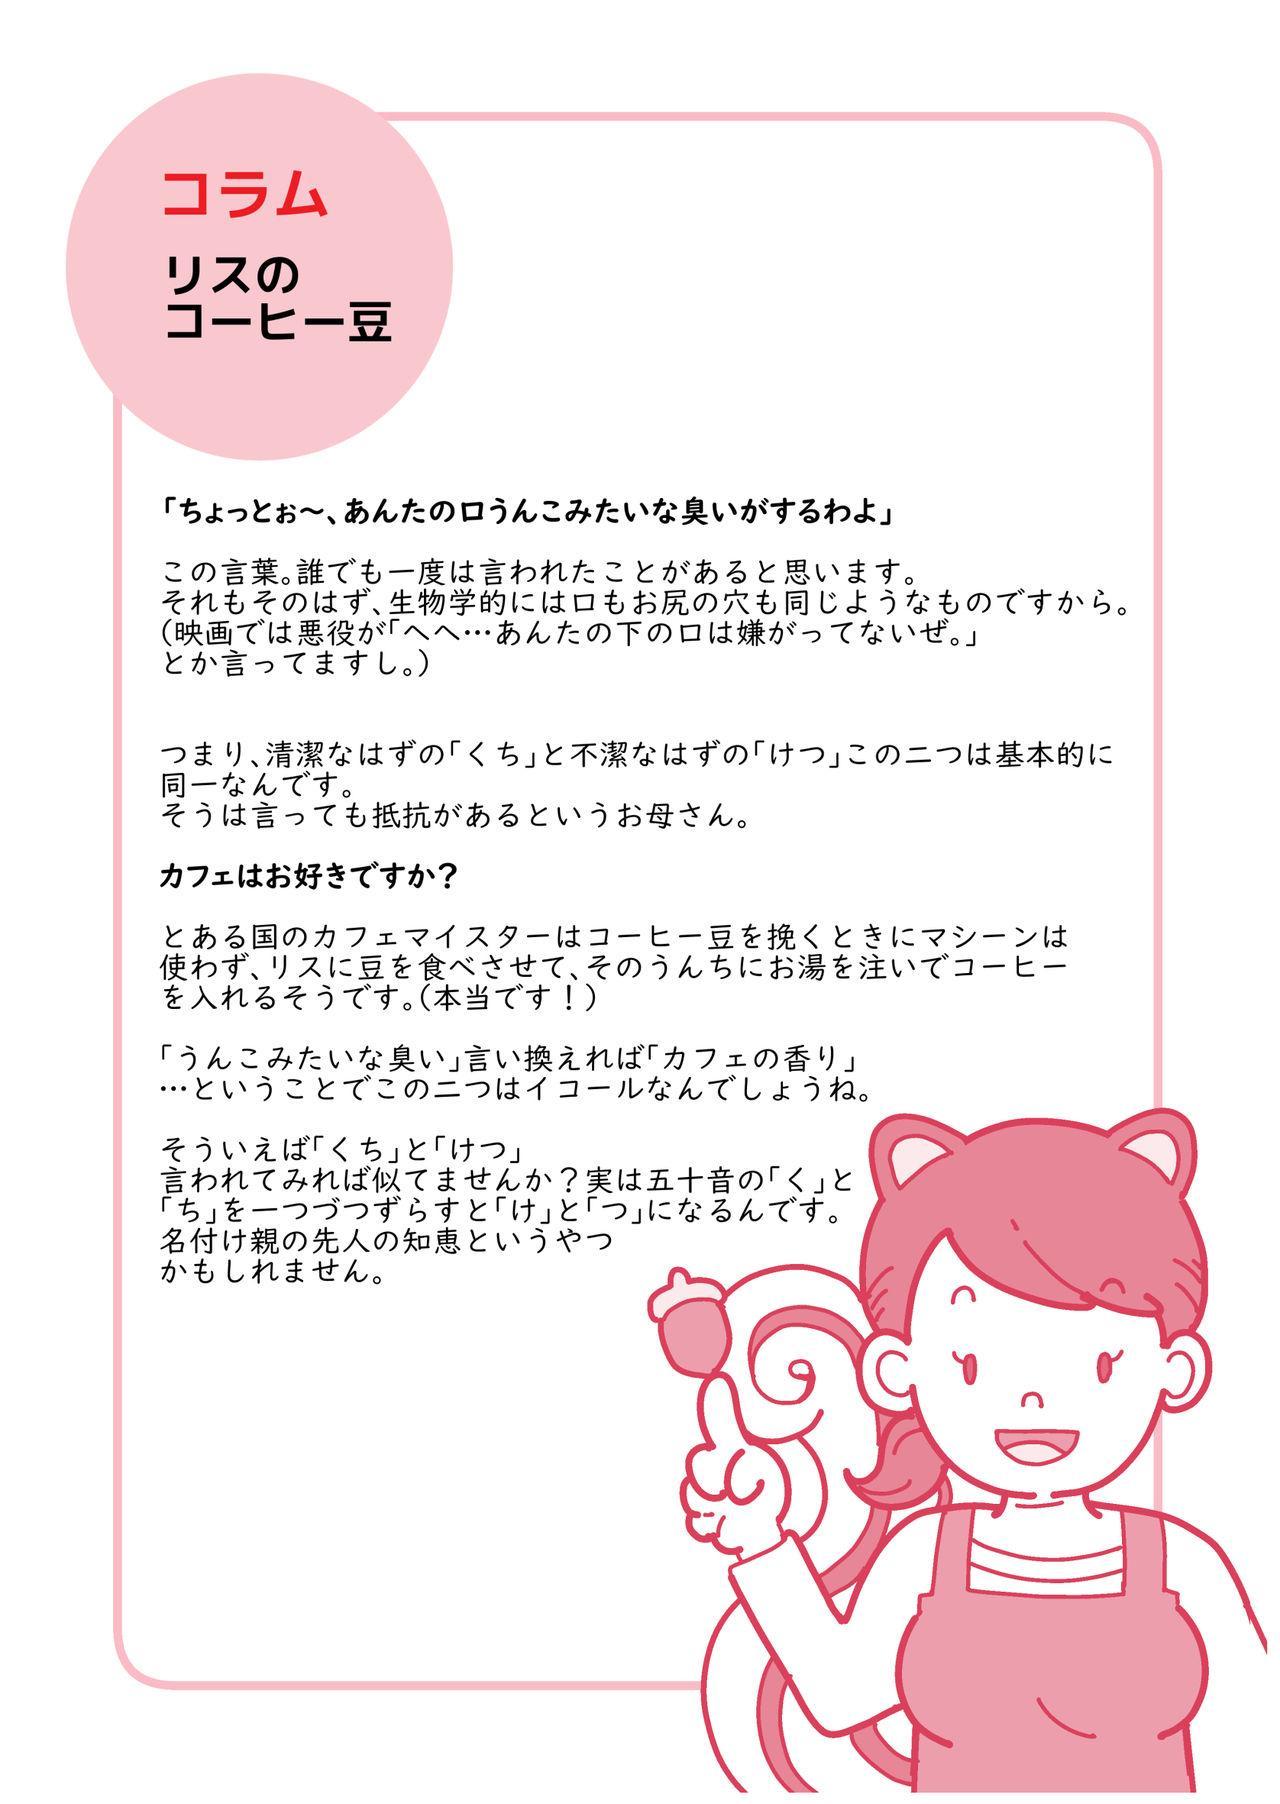 Isogasii Okaasan No Tamuno Sasa Rouzin Seikaigo | Guide for Elderly Sex Health Care to Busy Mom 53